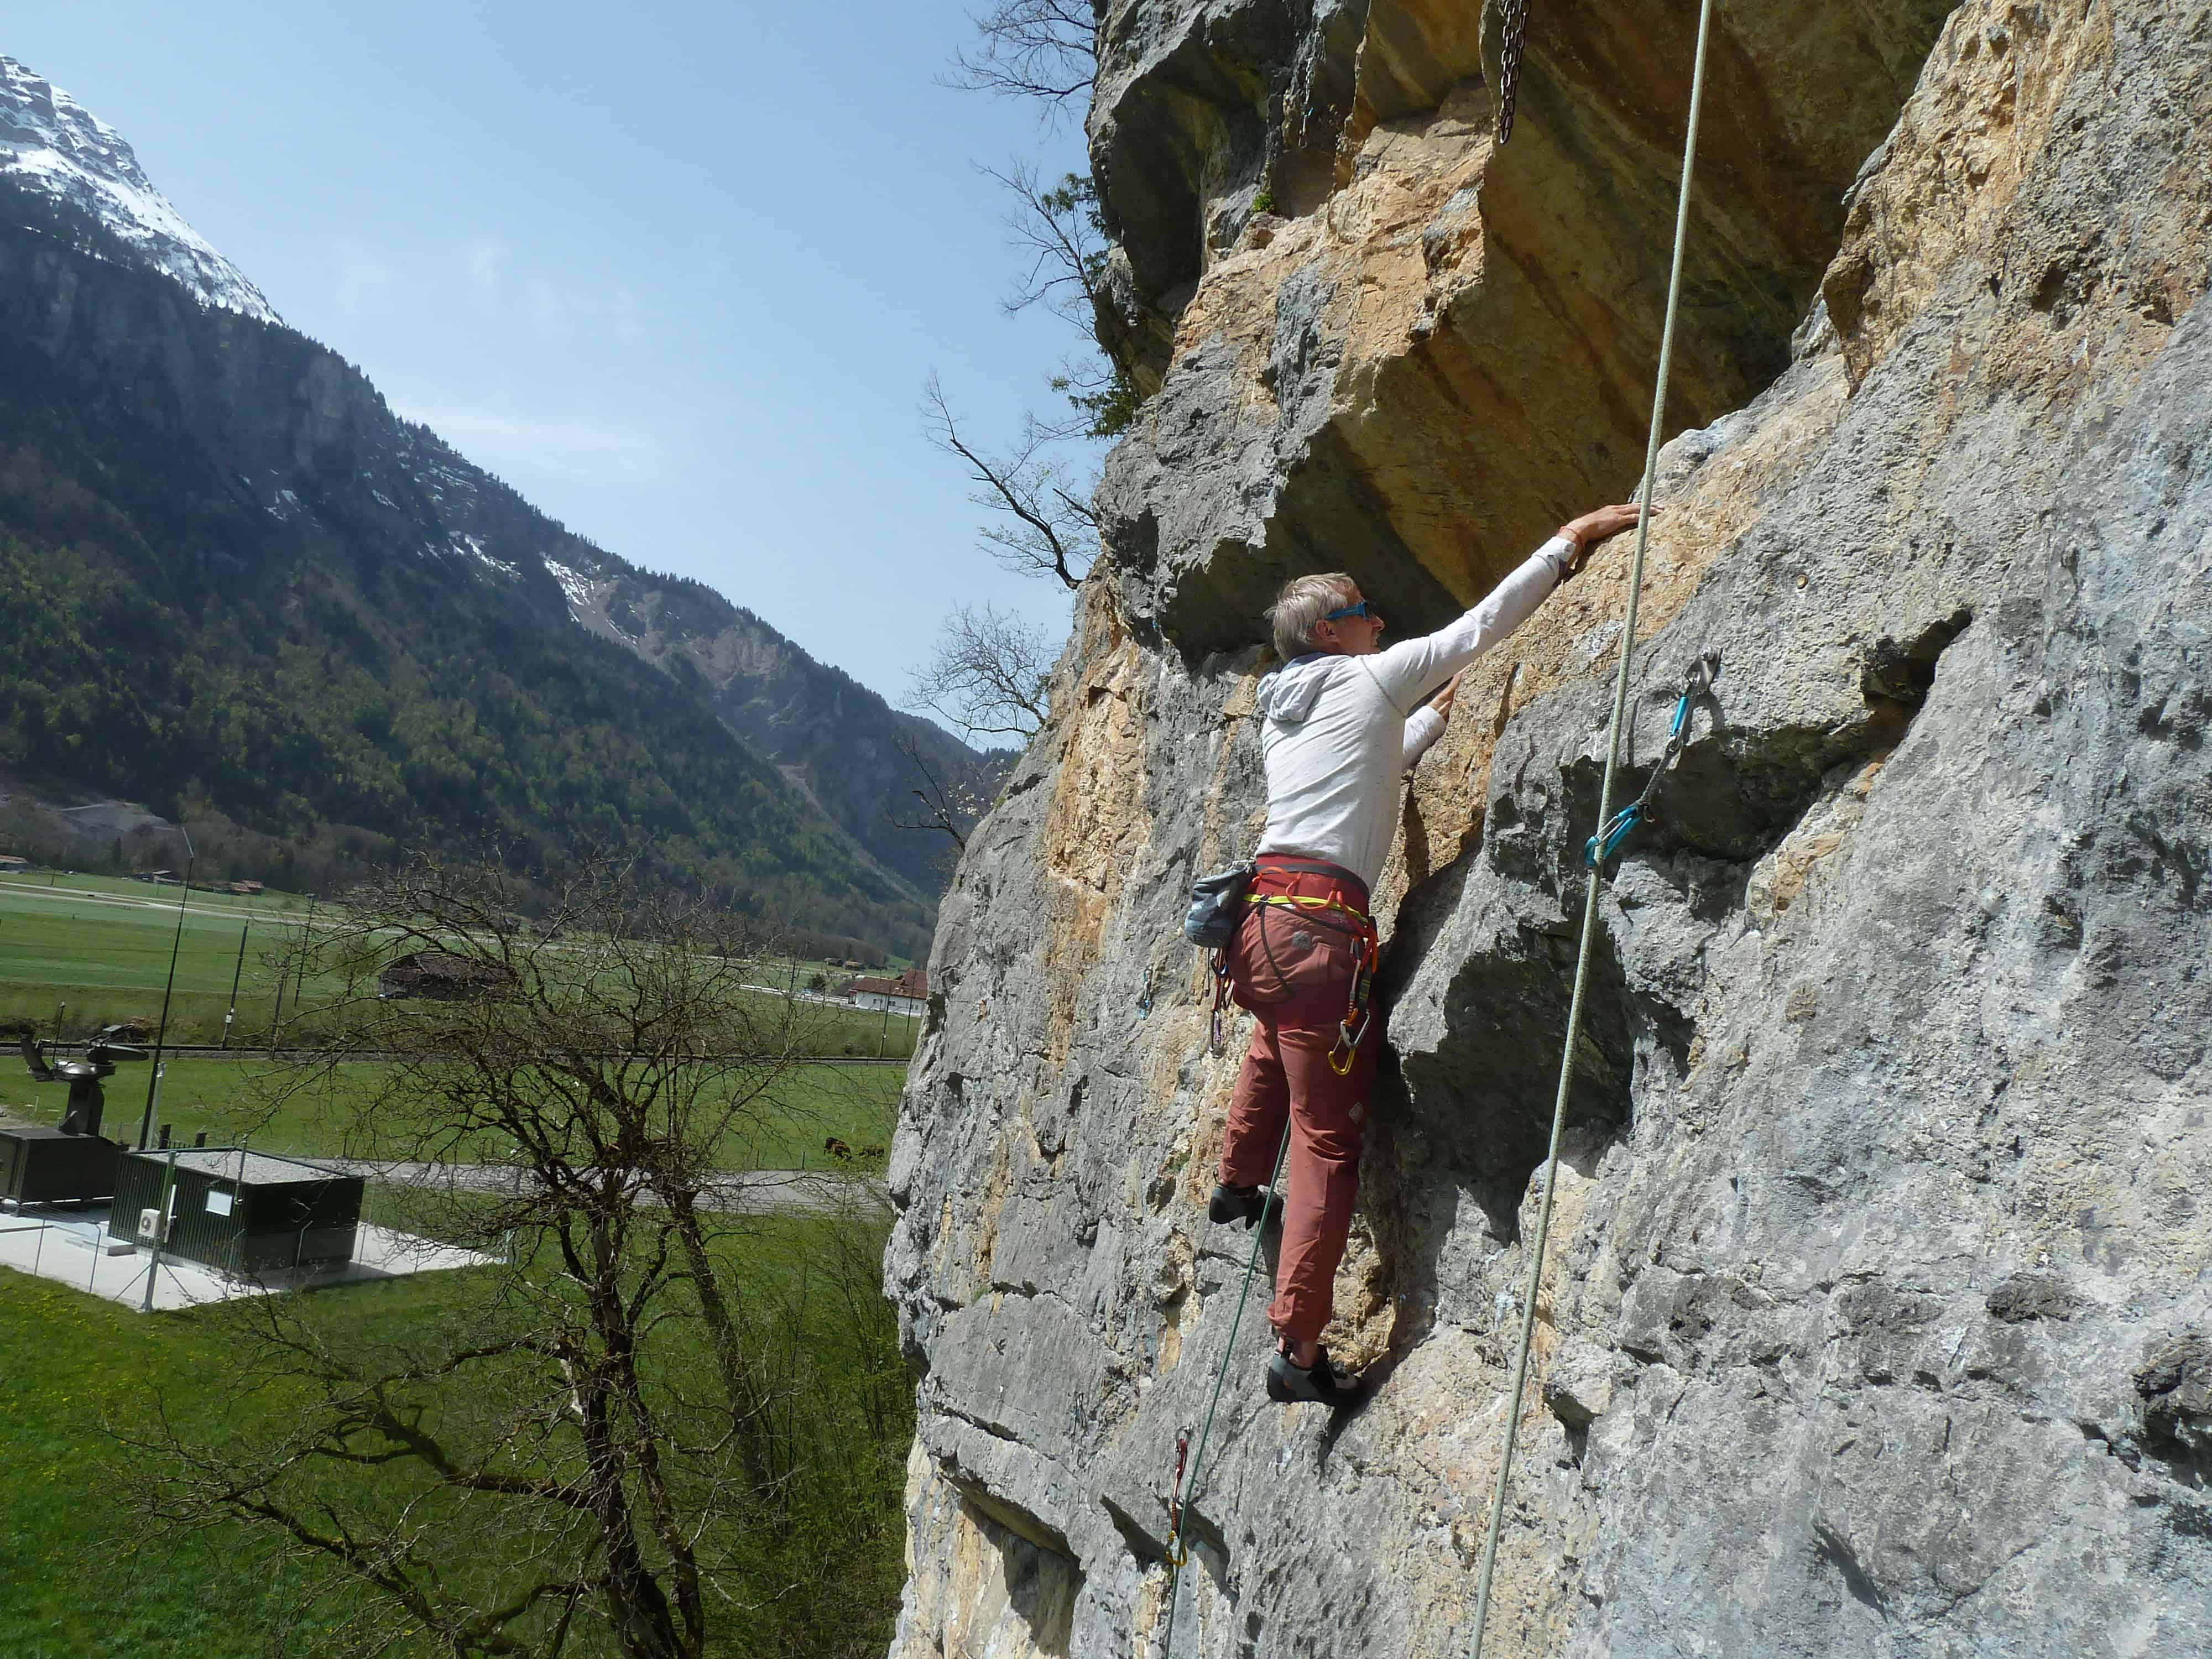 Klettern bei Meiringen